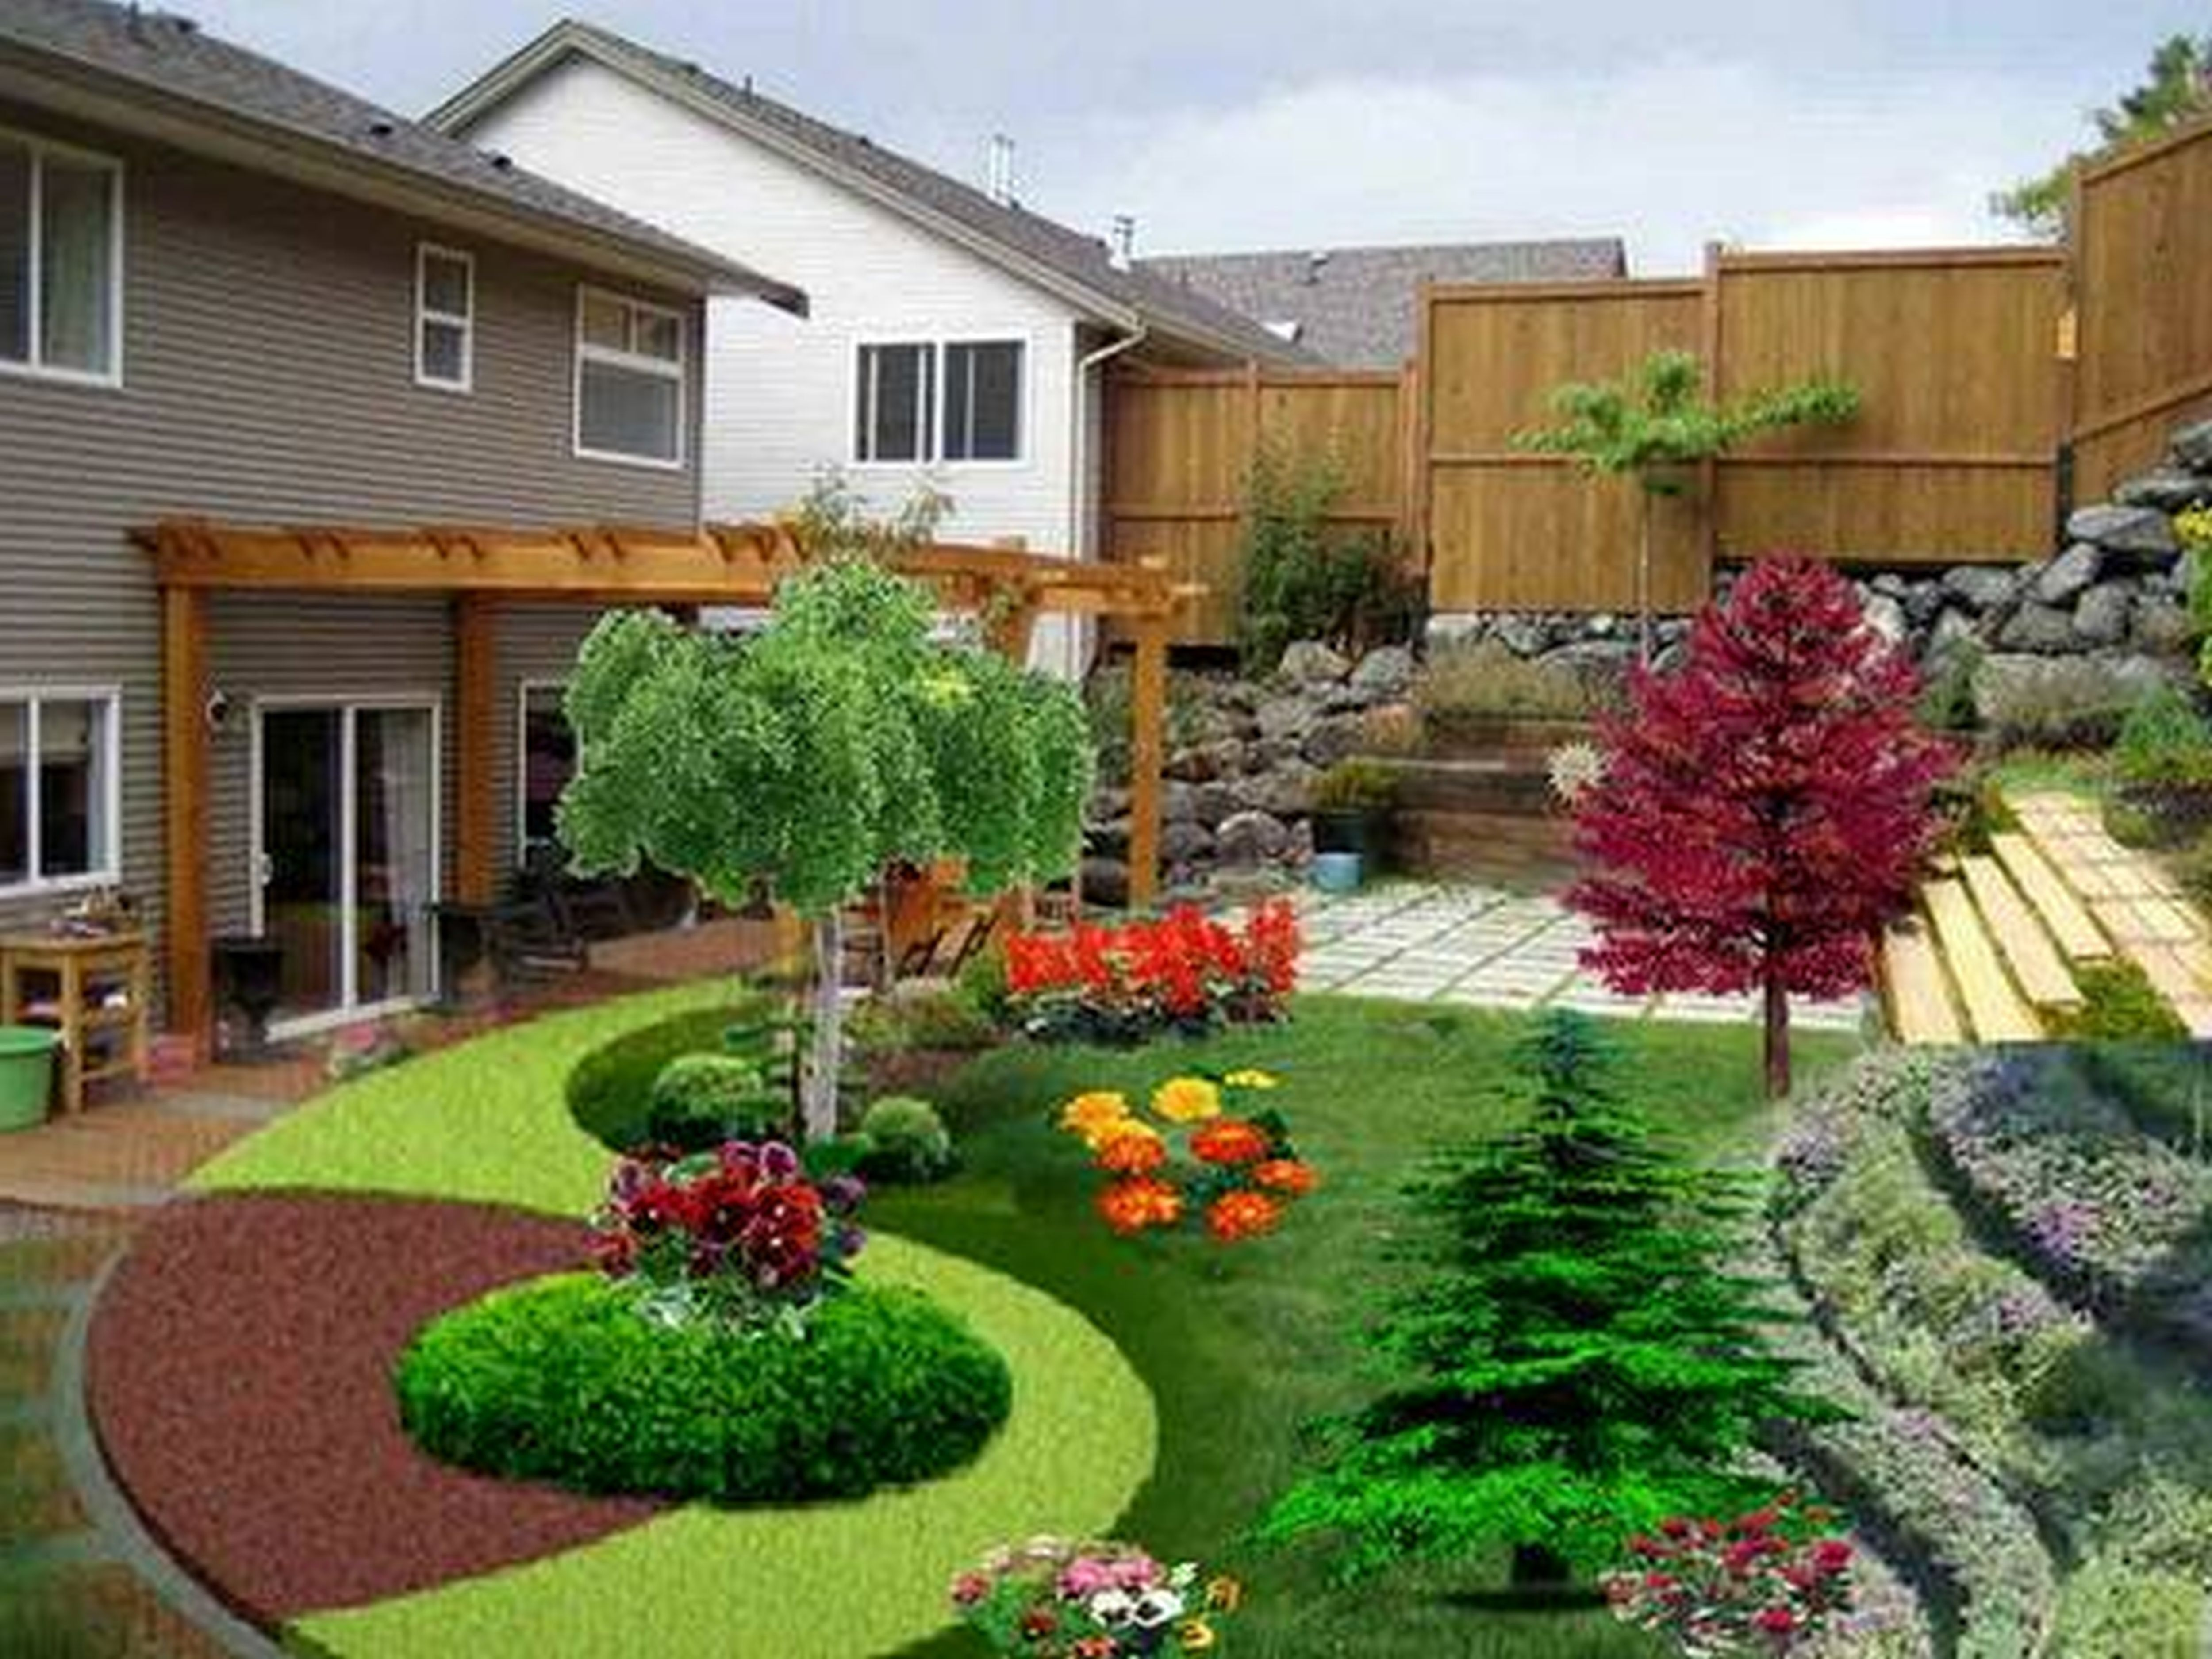 109 Latest Elegant Backyard Design You Need To Know Gardens